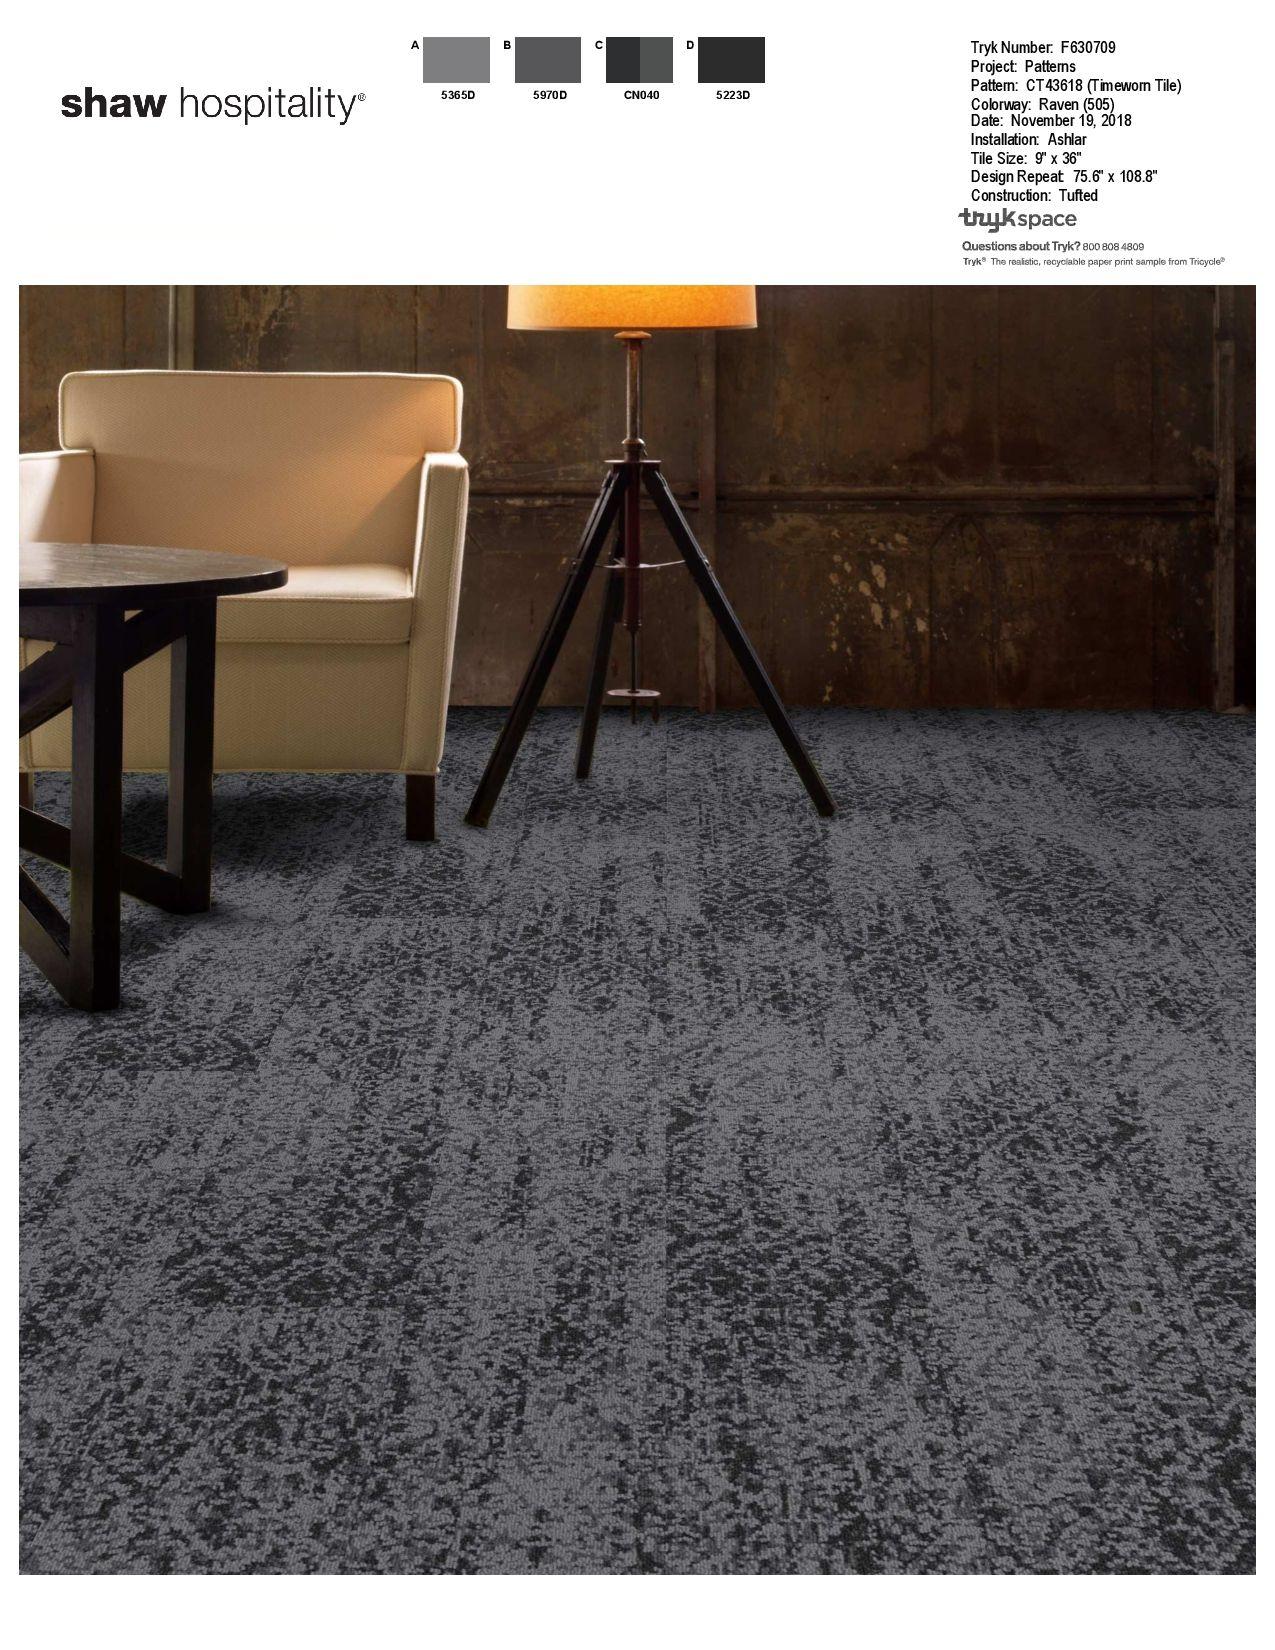 F630709 Shaw Hospitality Carpet Home Decor Shaw Hospitality